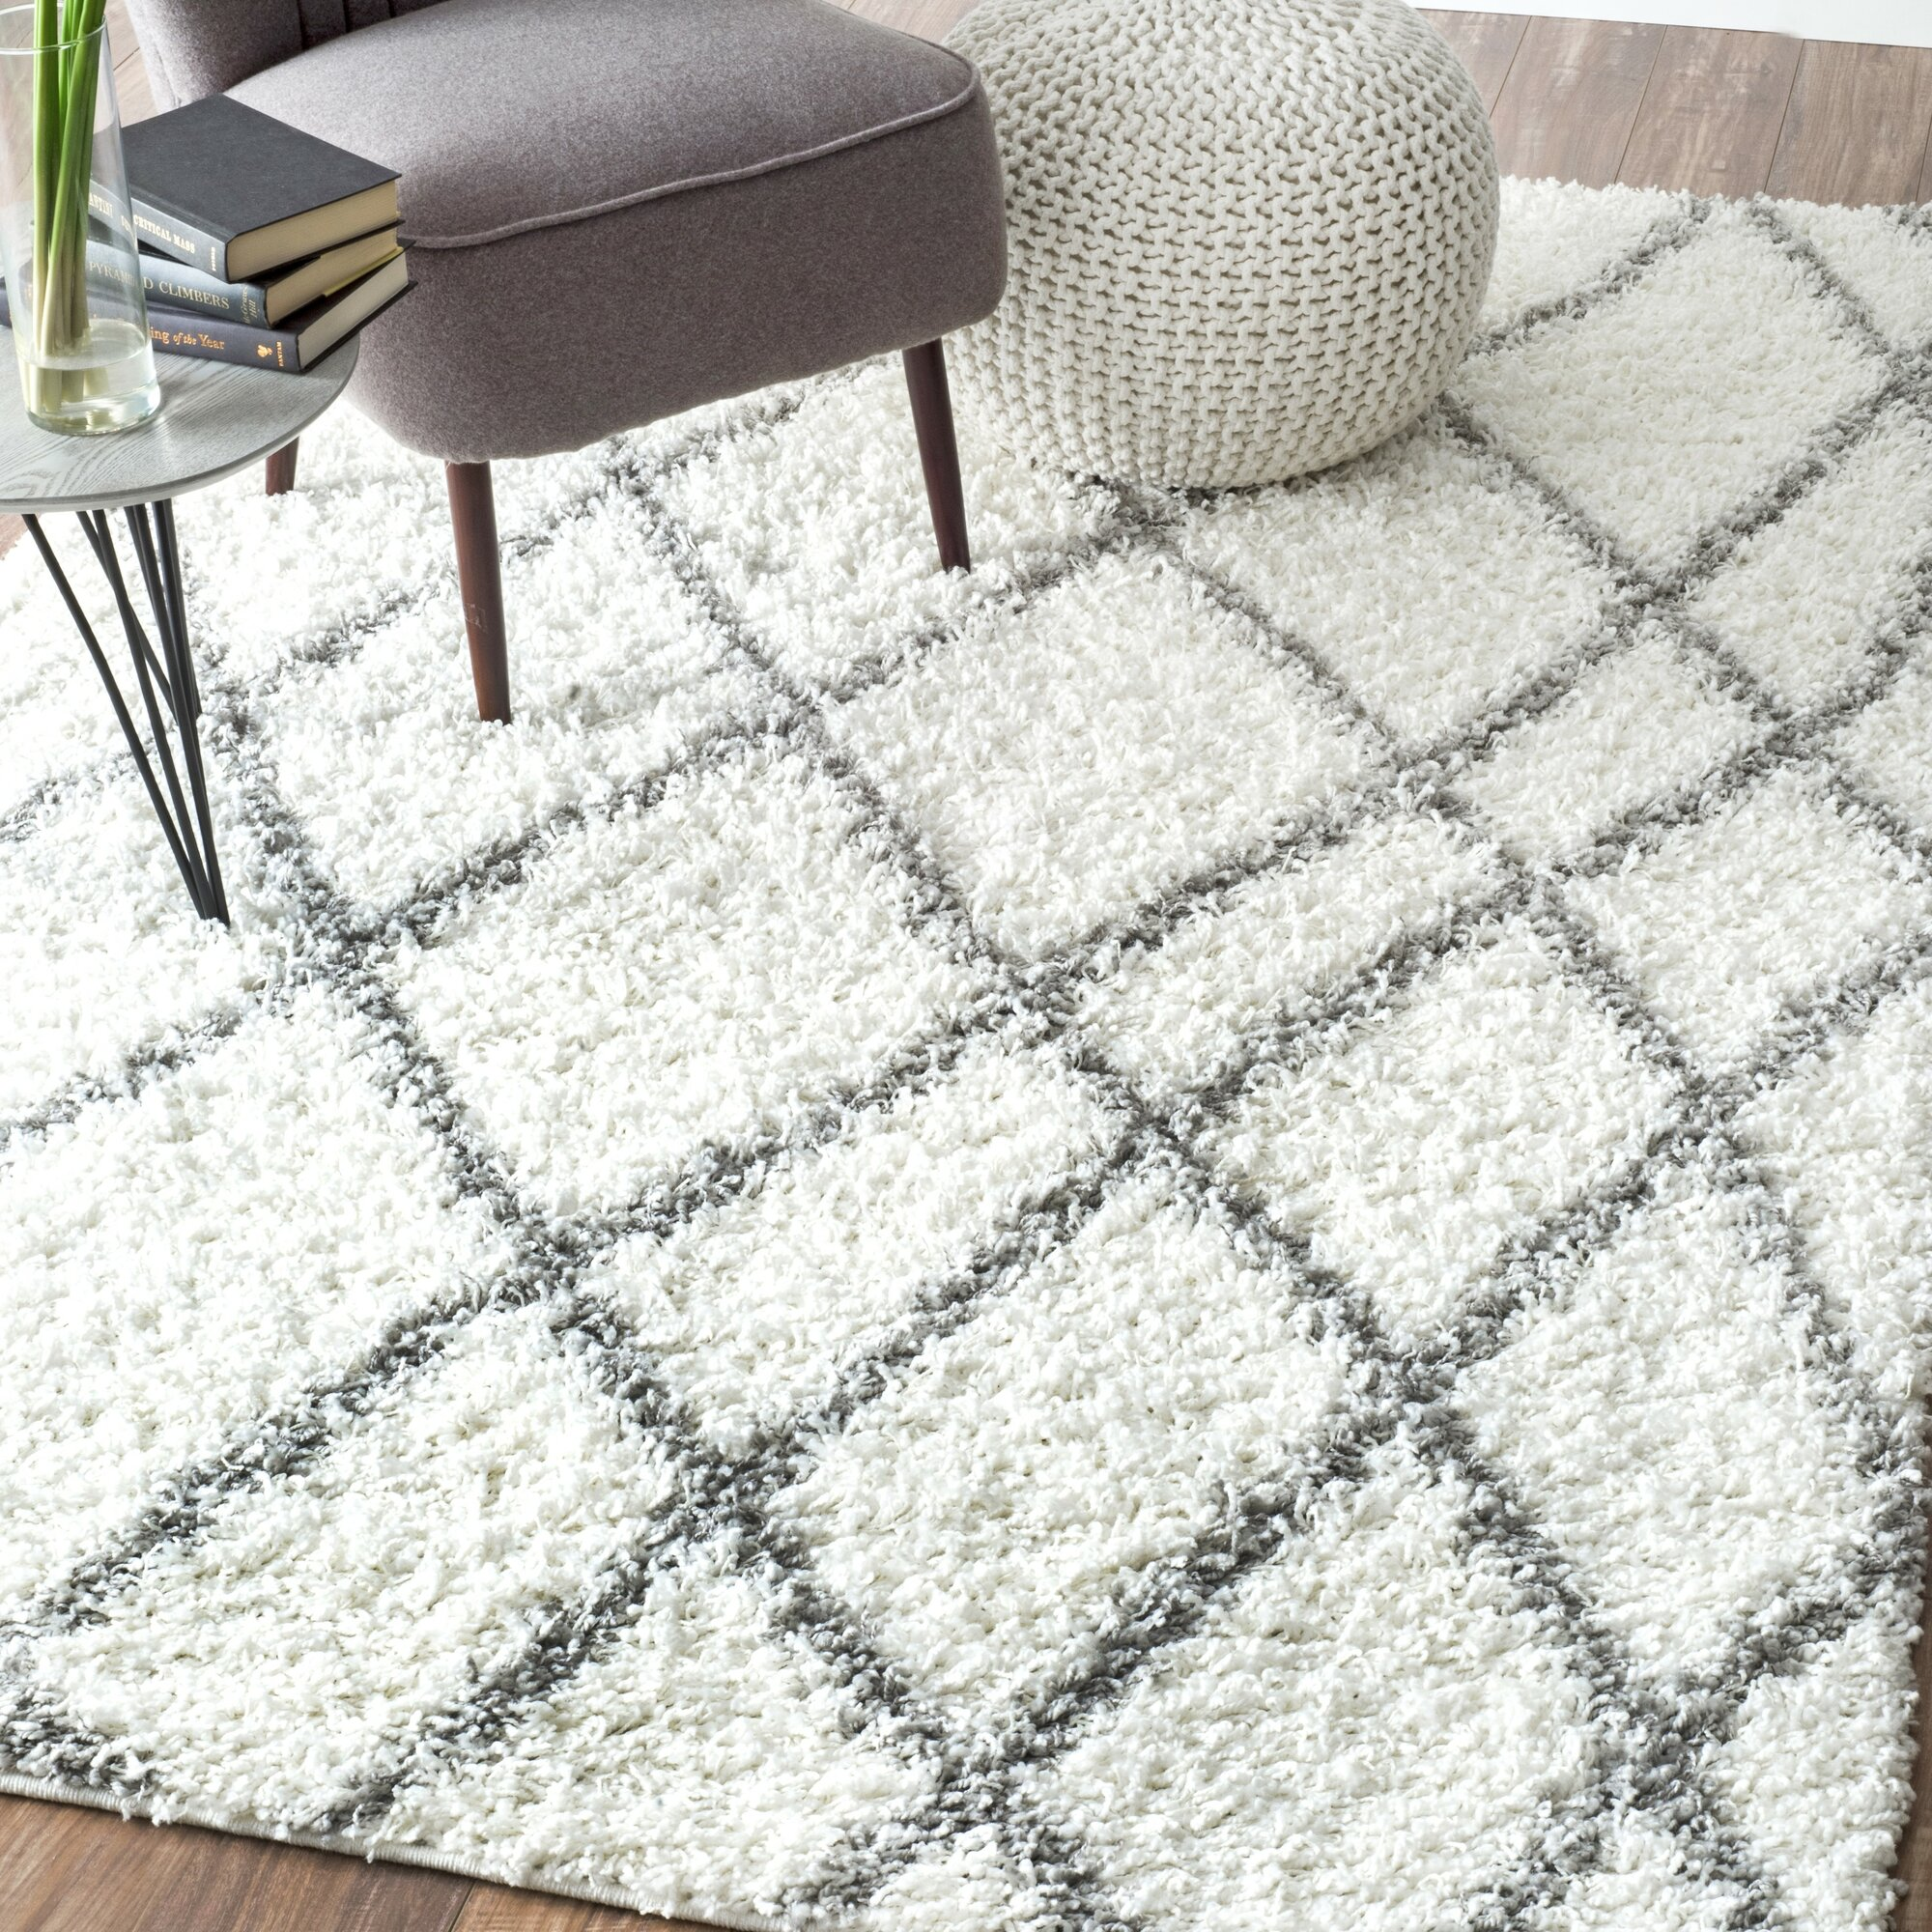 Rugs And Home Design Visalia Ca ~ Instahomedesign.us